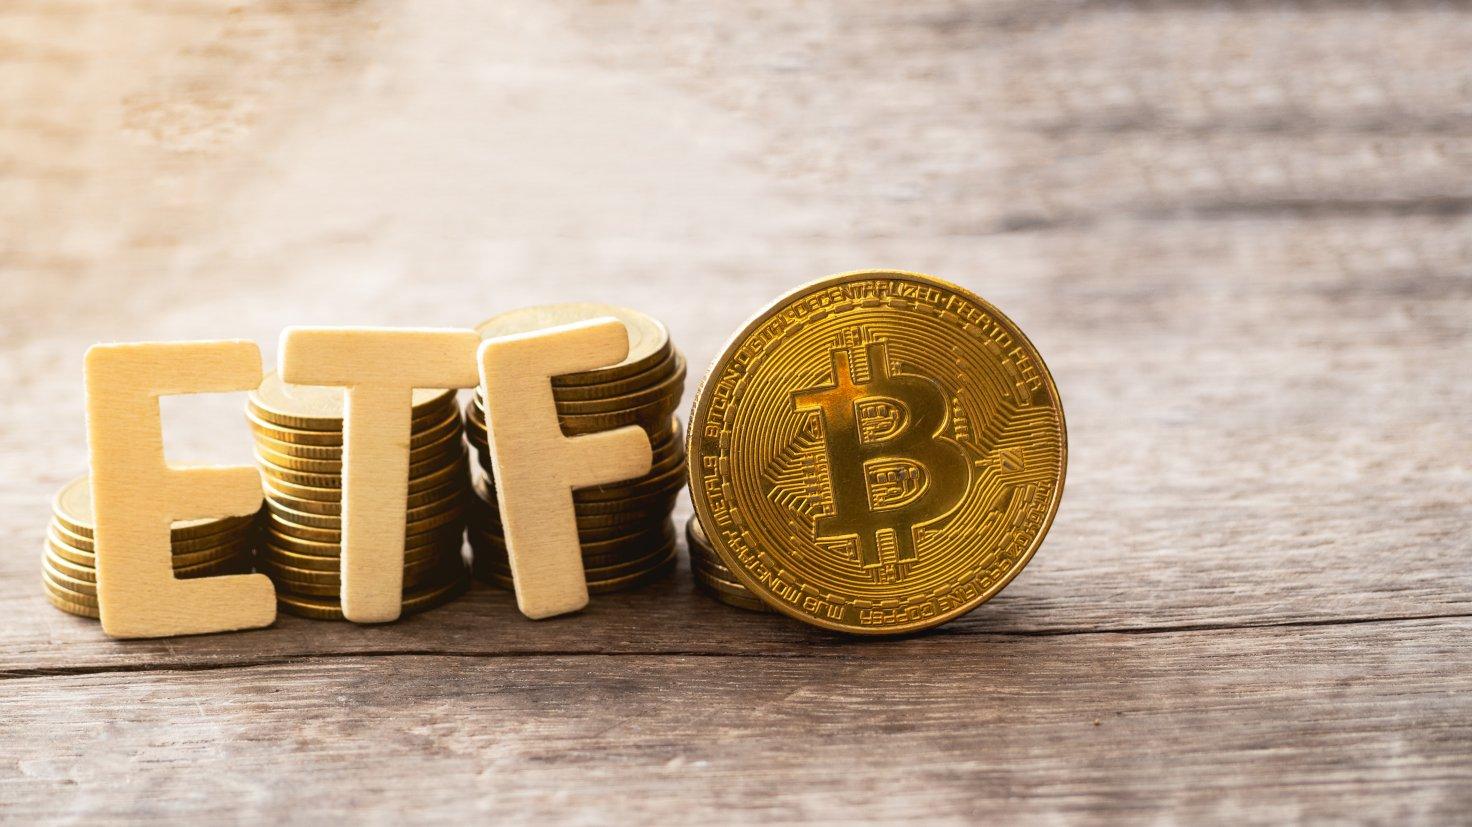 kuzey amerikanin ilk bitcoin etfsi kanadadan onay aldi